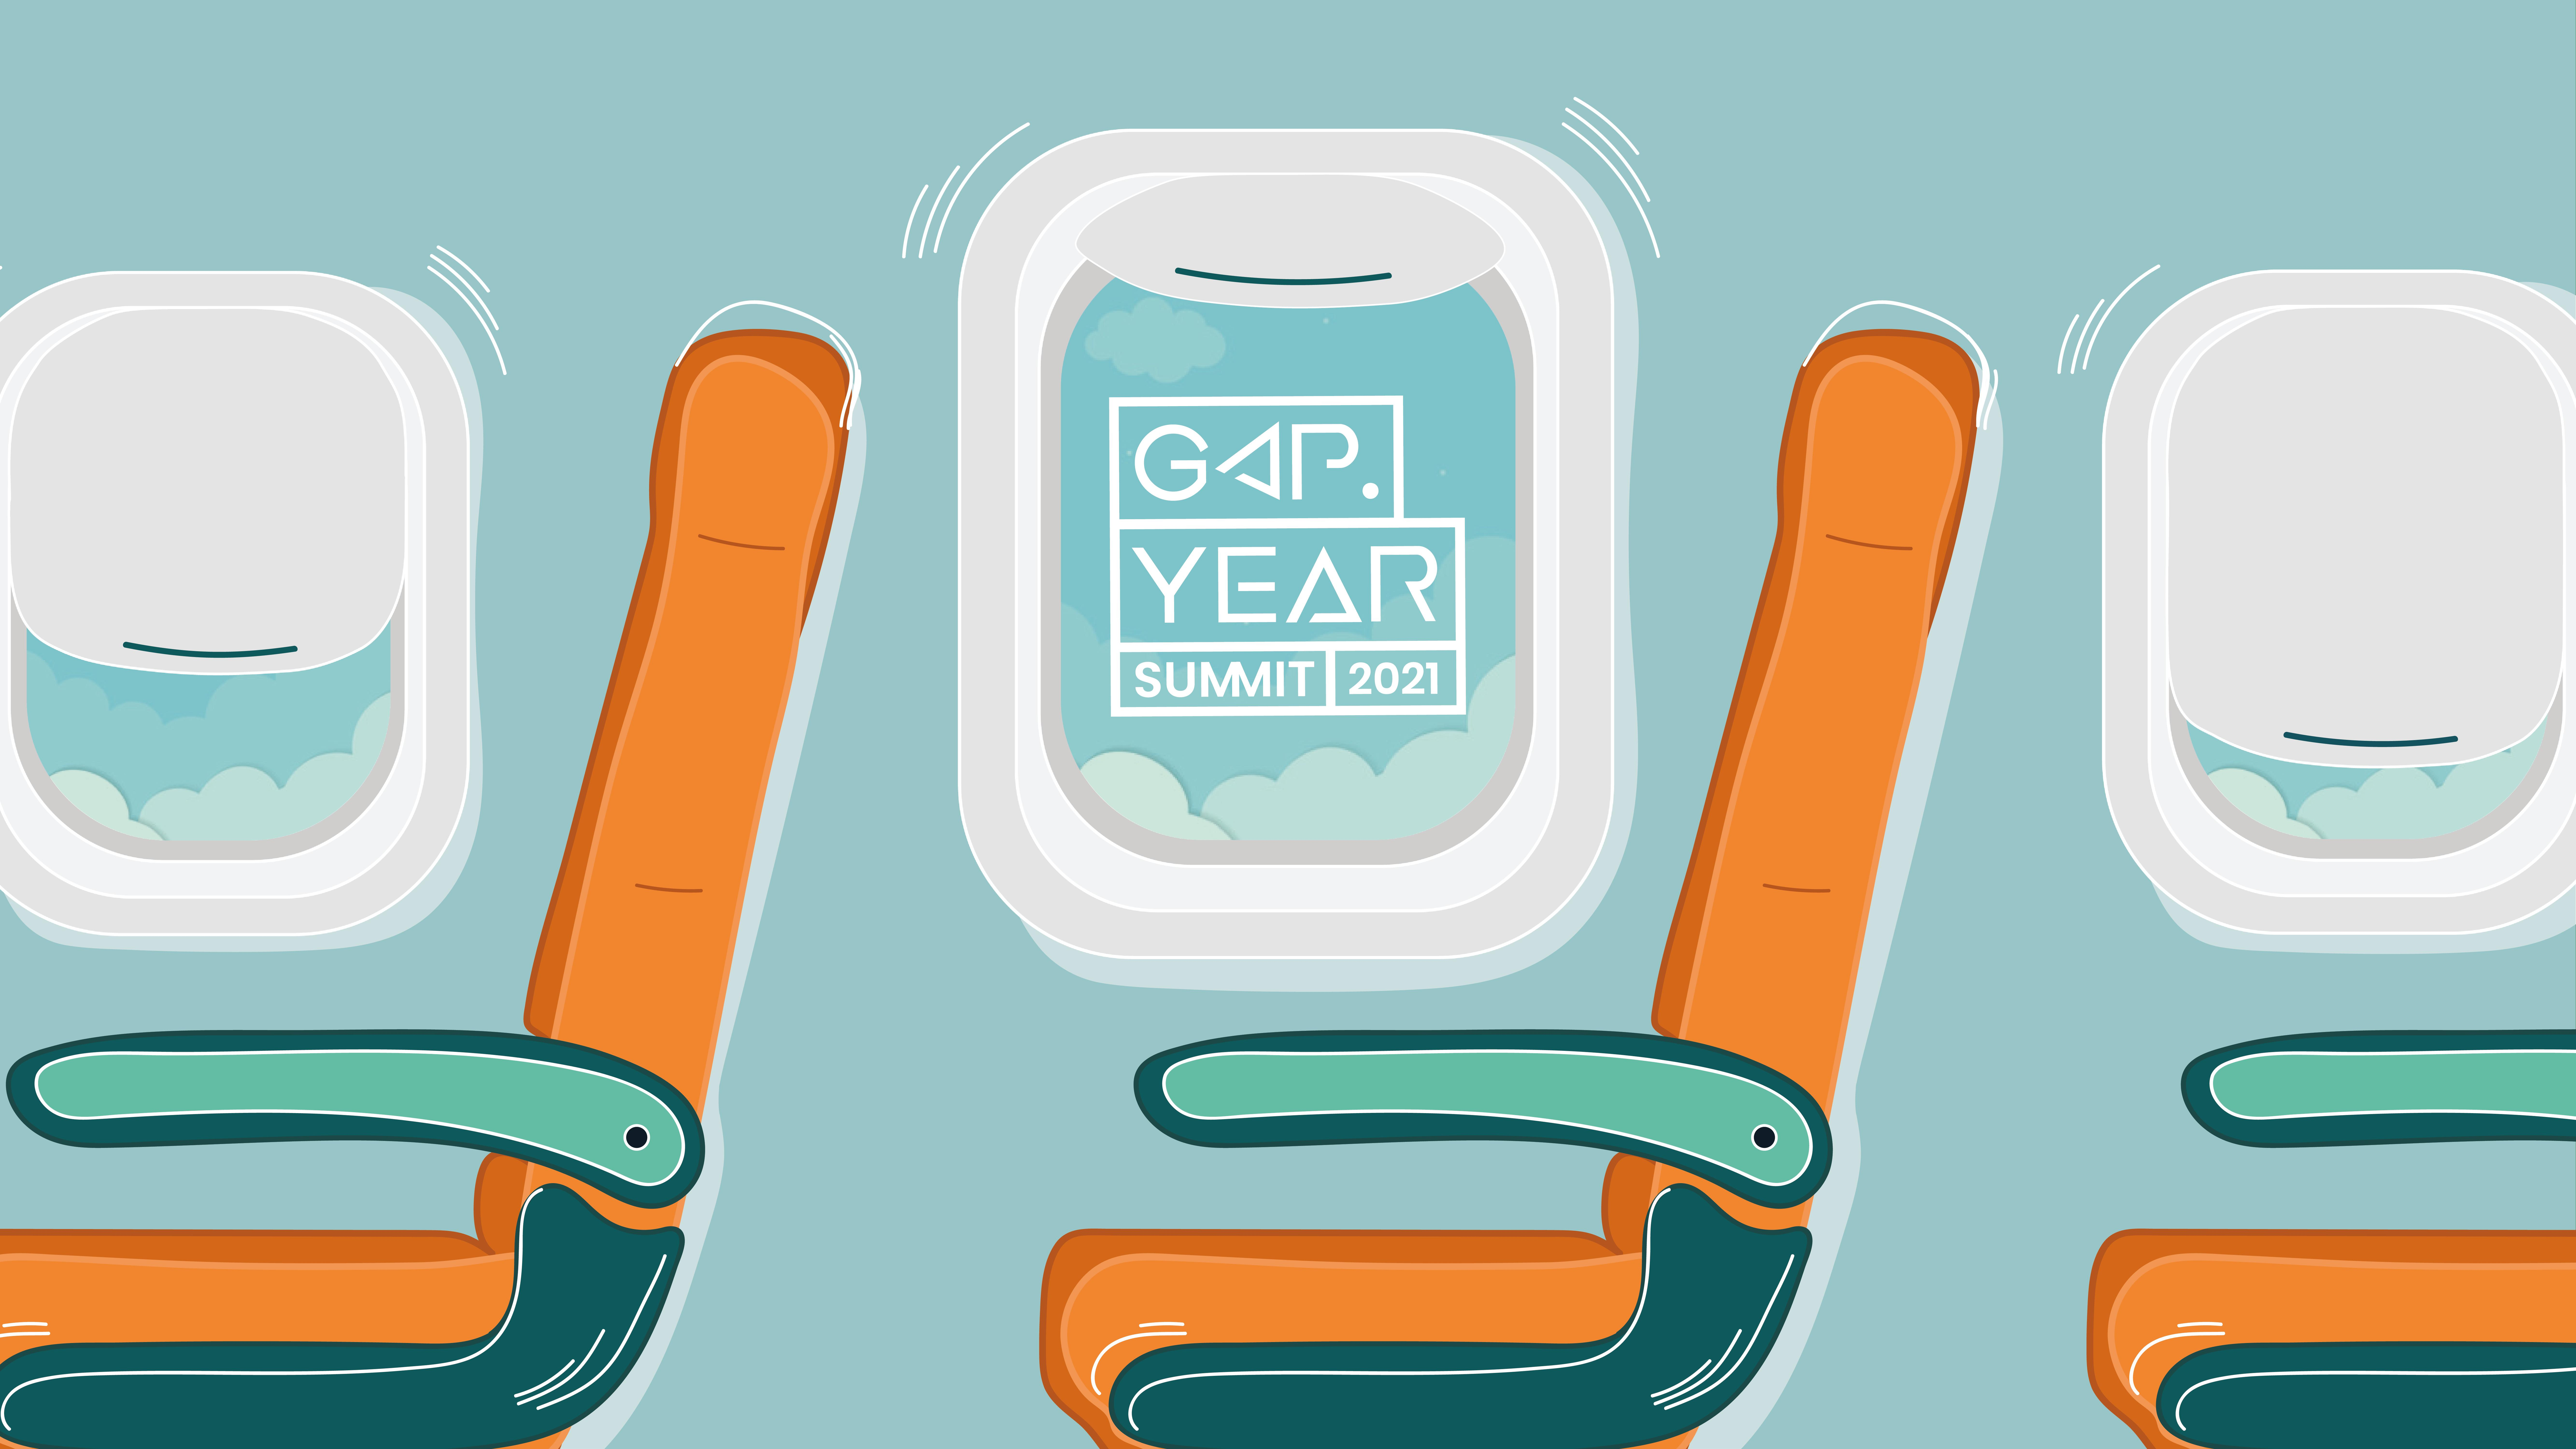 Banner do gap year Summit